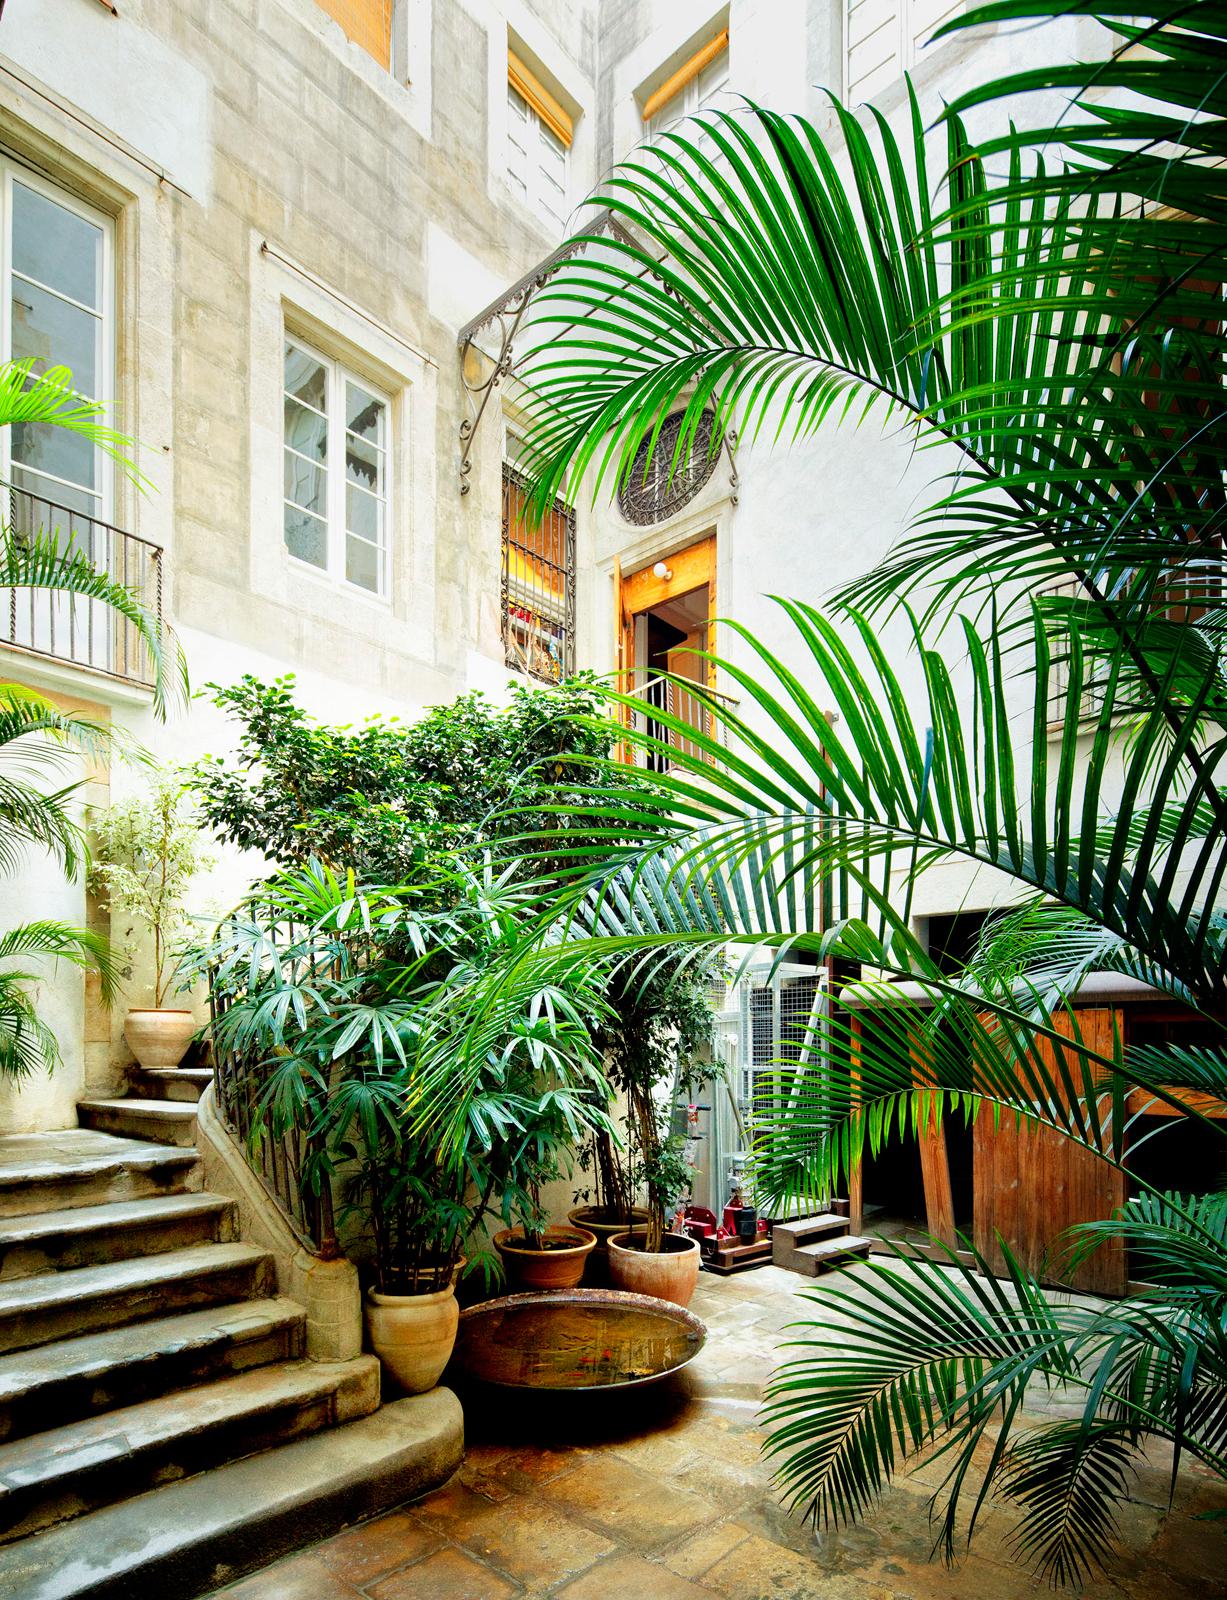 Indoor outdoor garden by concrete staircase